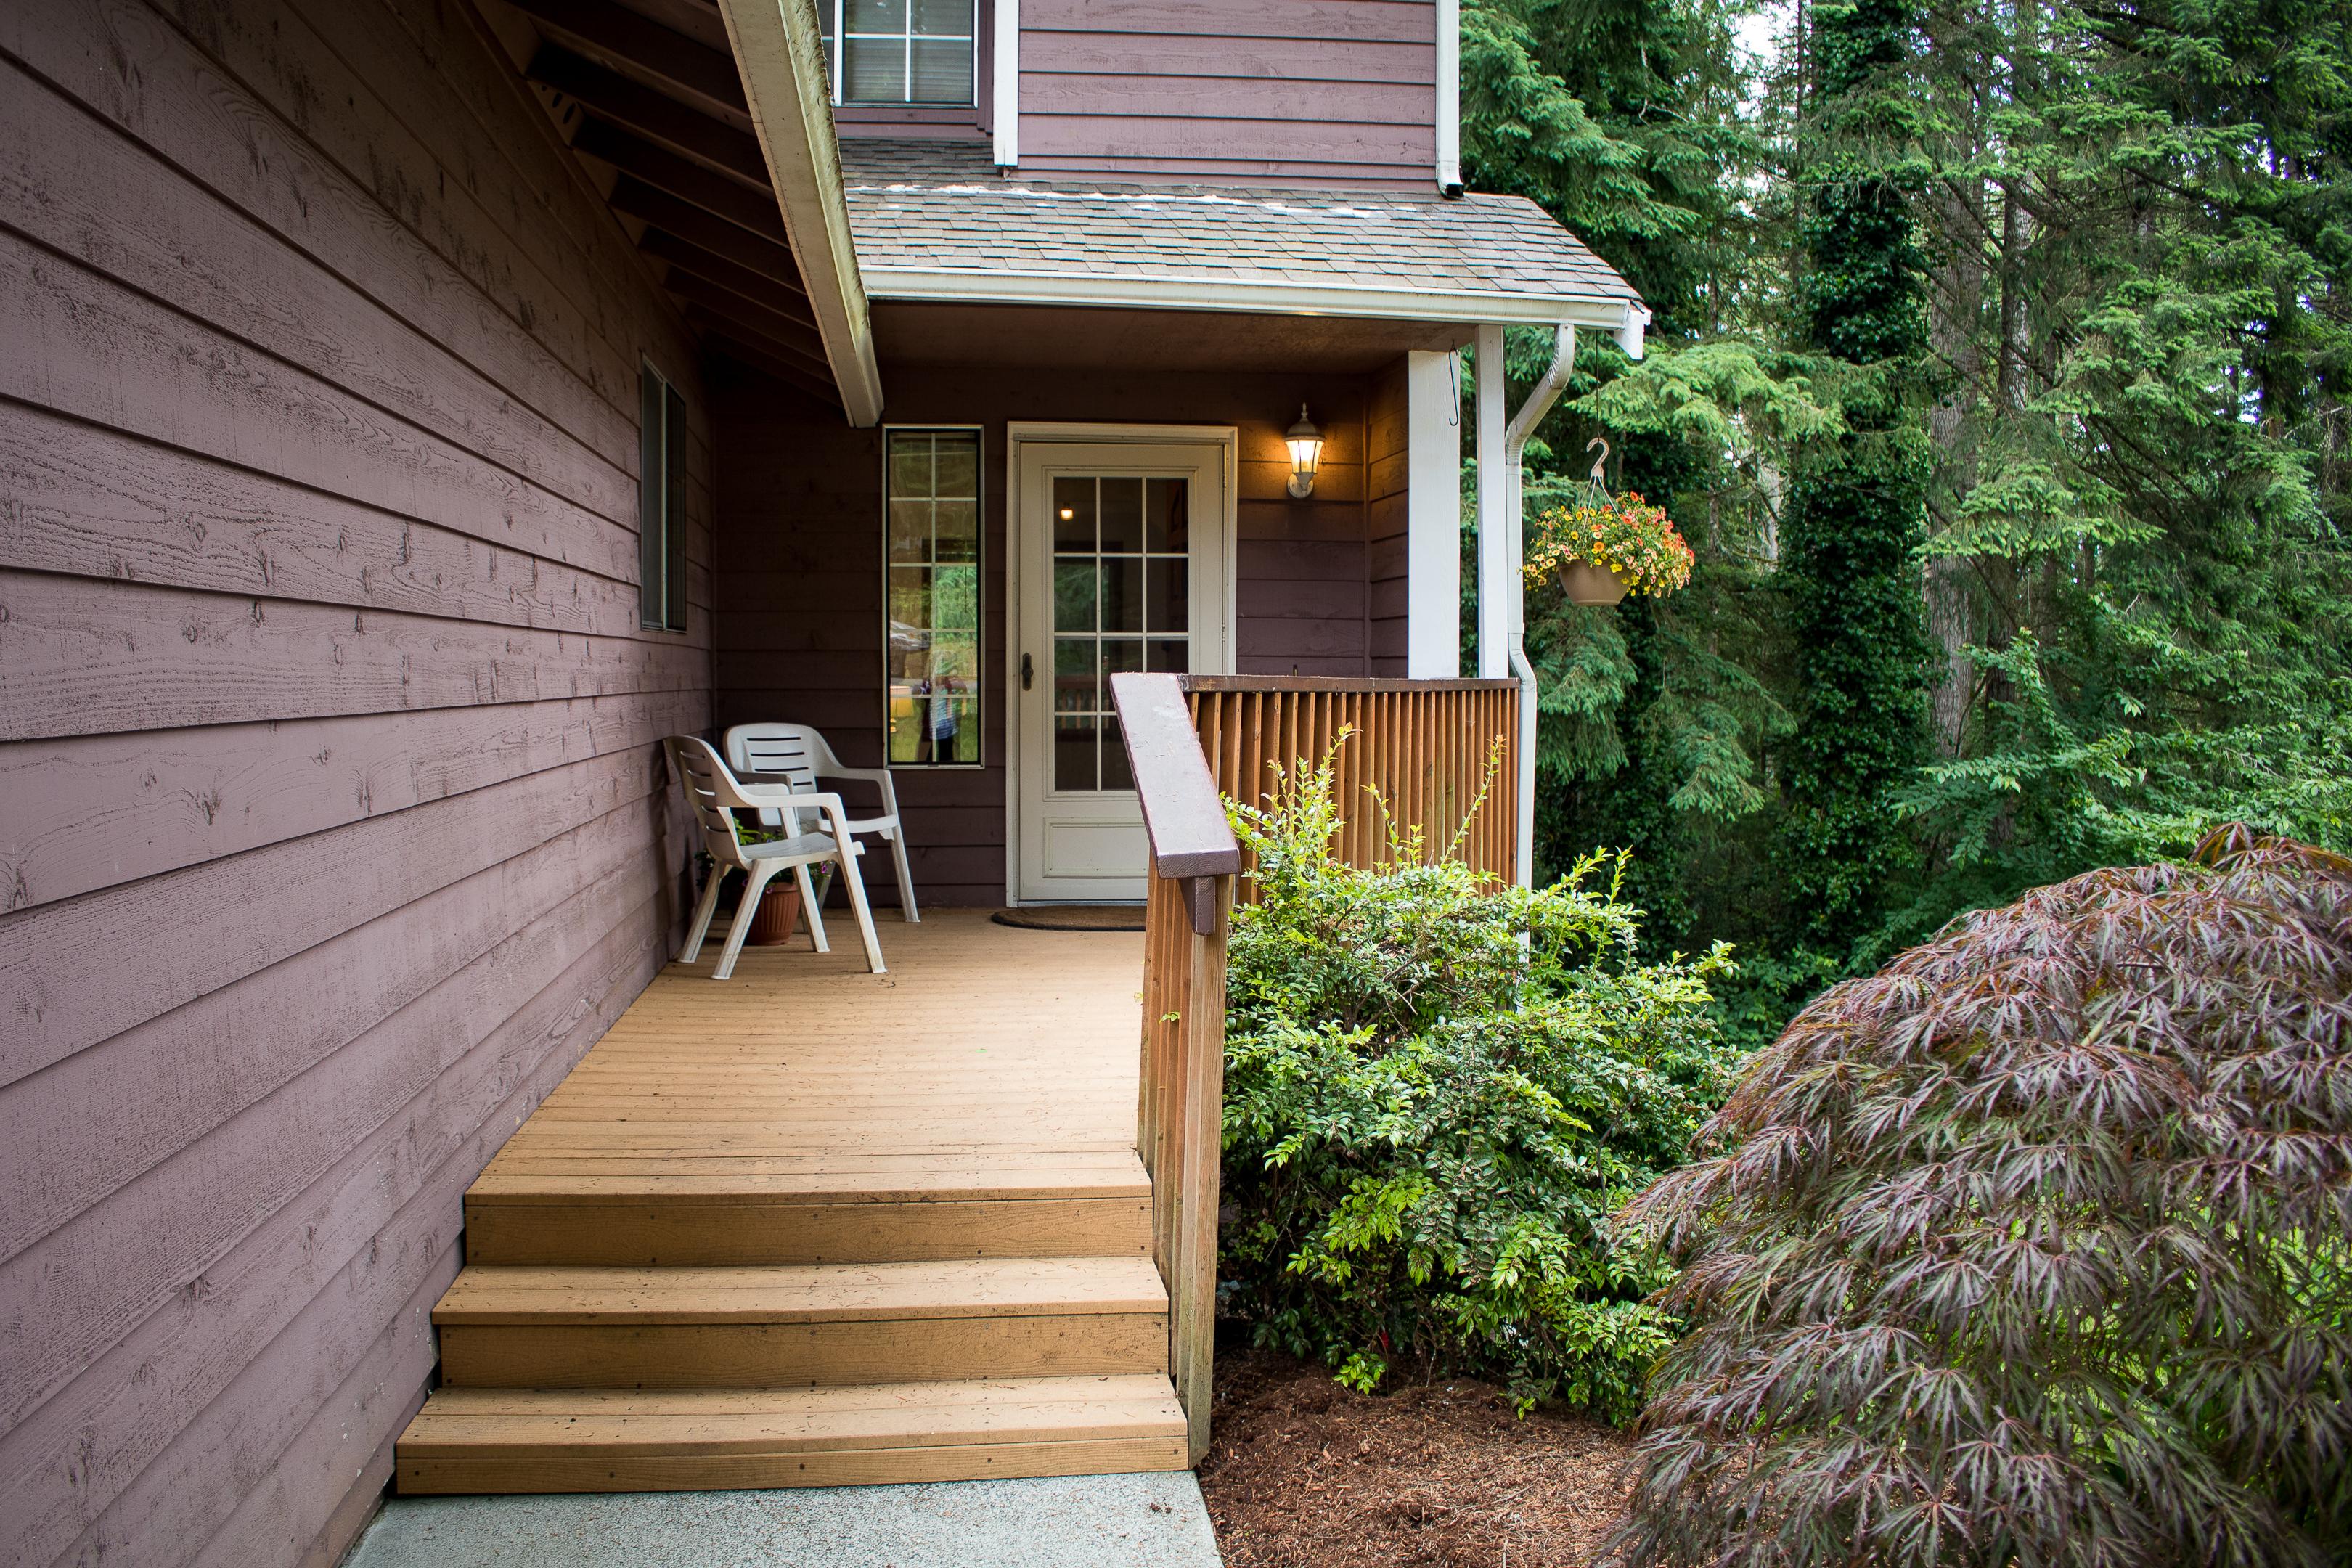 20170621 McArdle Real Estate -AEF 3